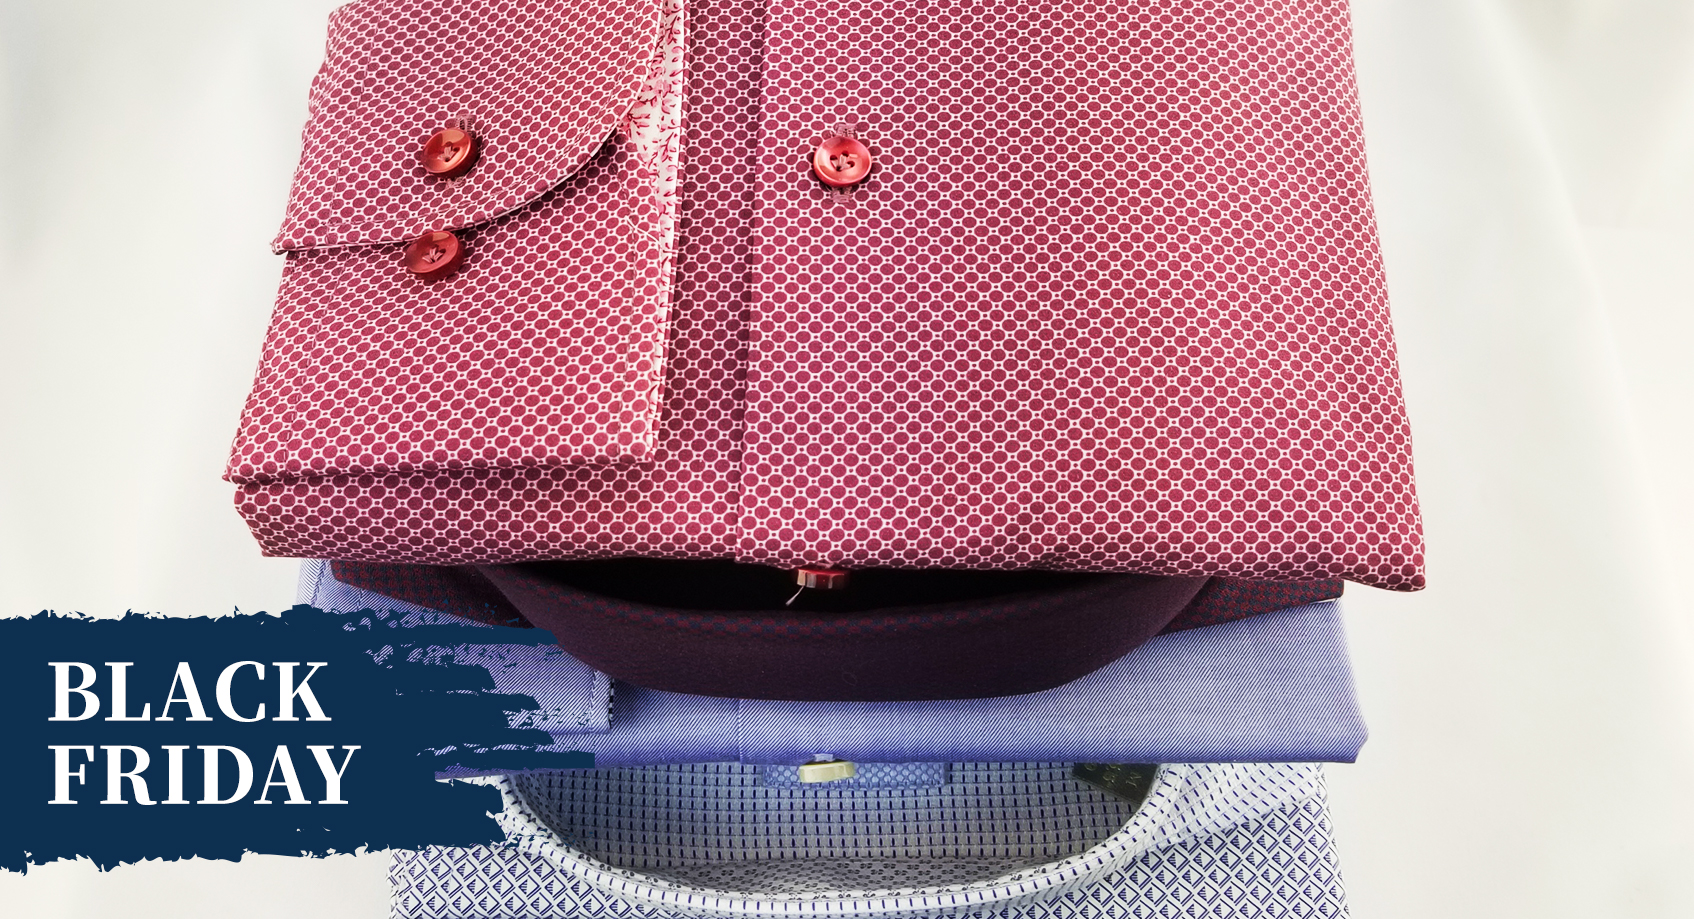 jaf_blackfriday_web_1694x919_02-chemise